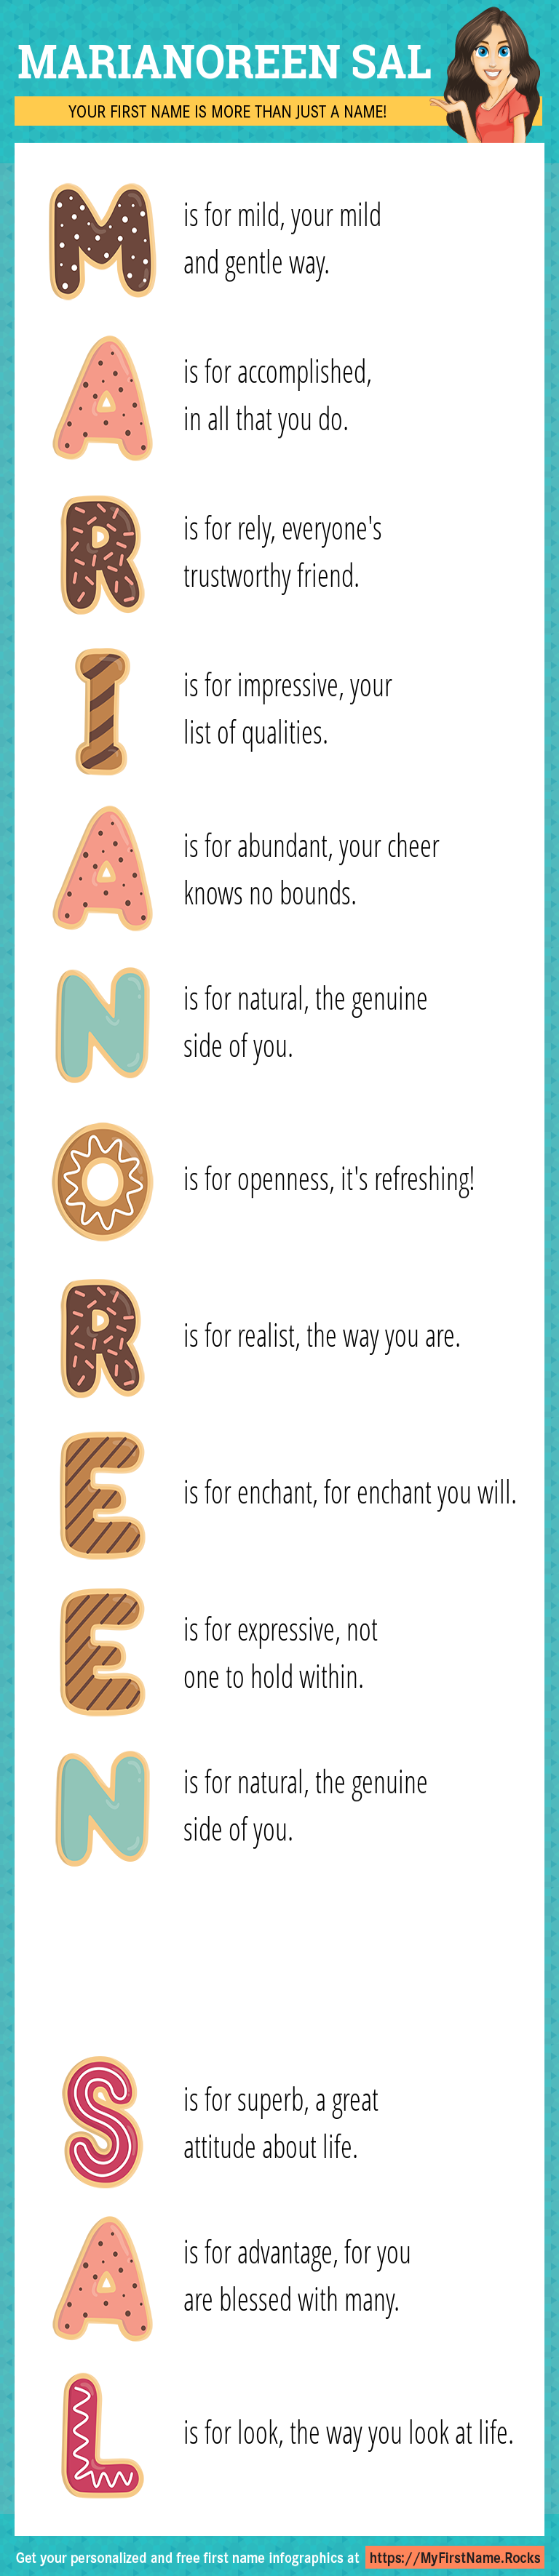 Marianoreen Sal Infographics